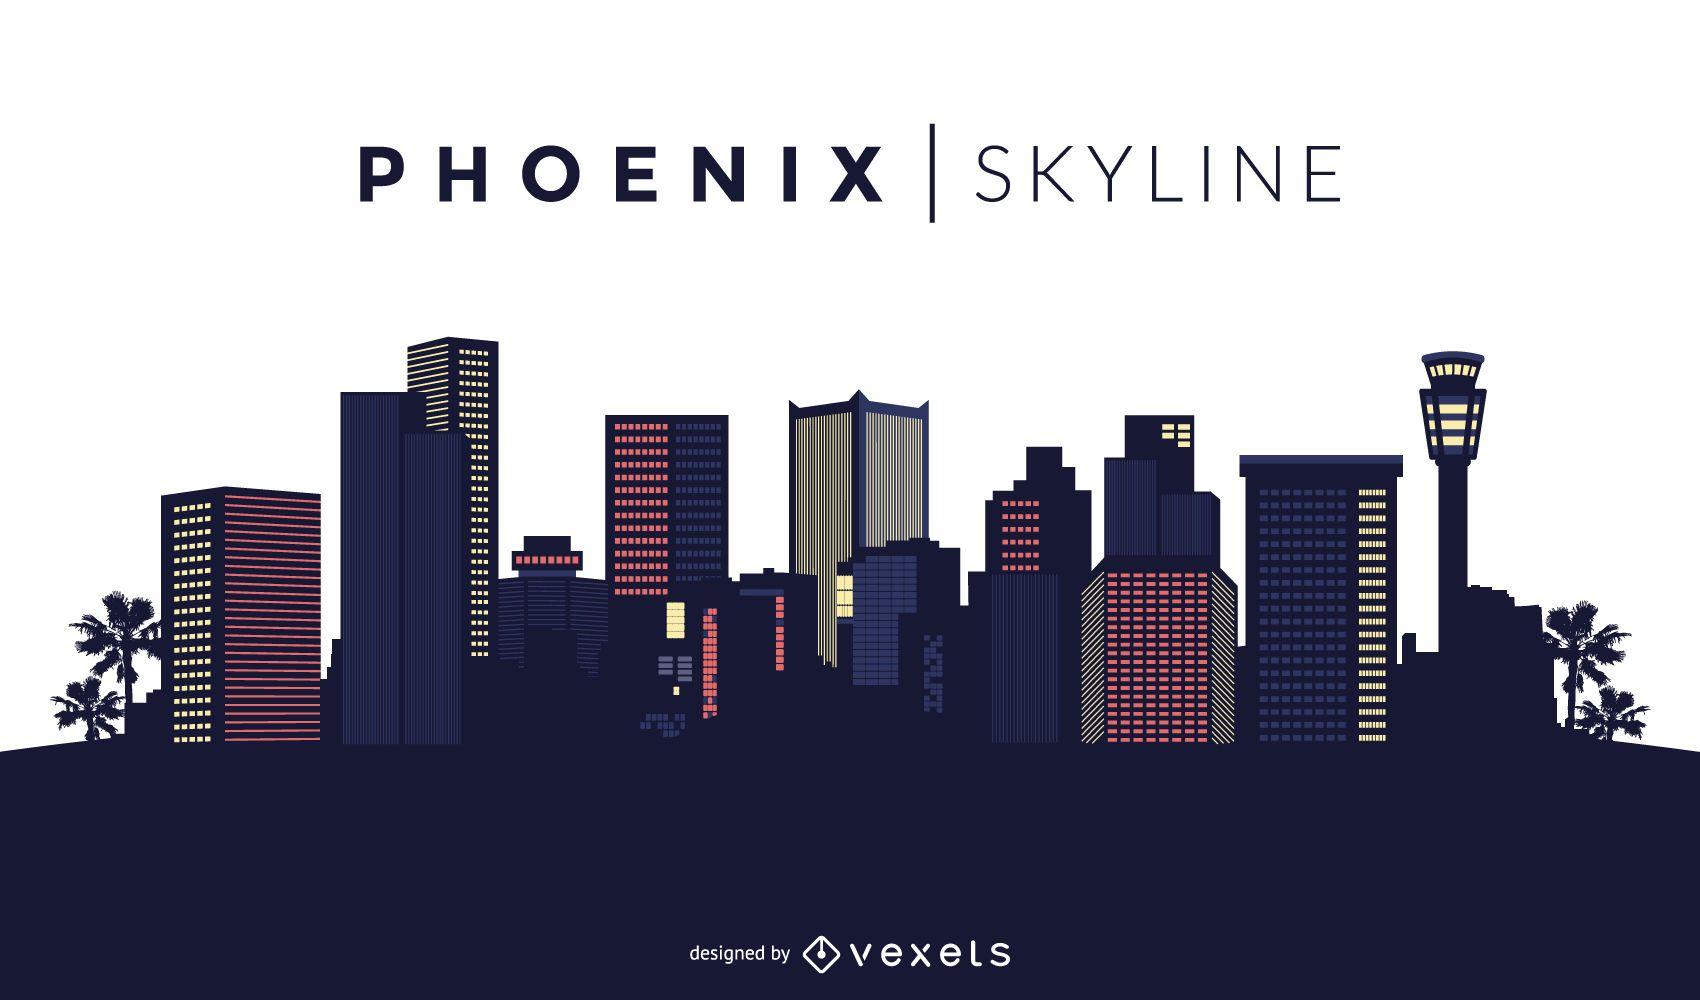 Dise?o del horizonte de Phoenix